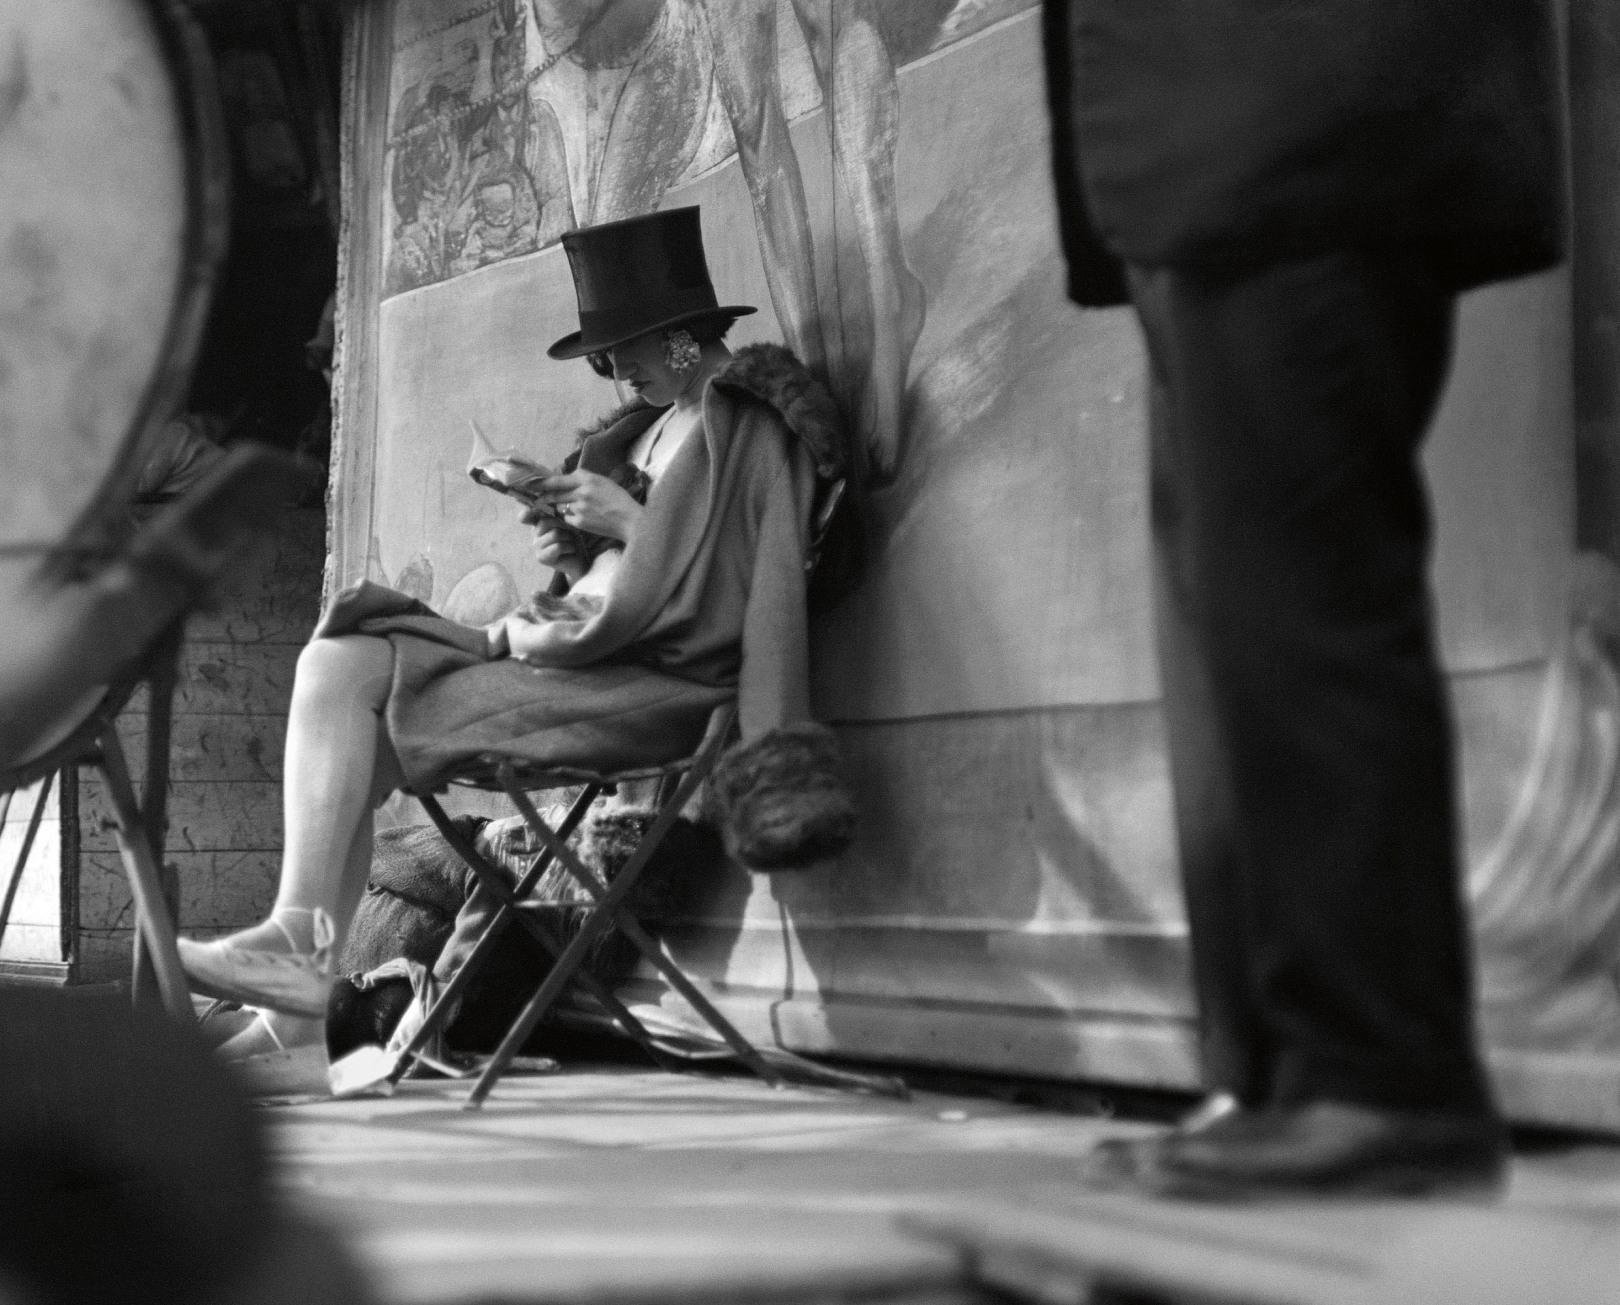 Fotografía de André Kertesz